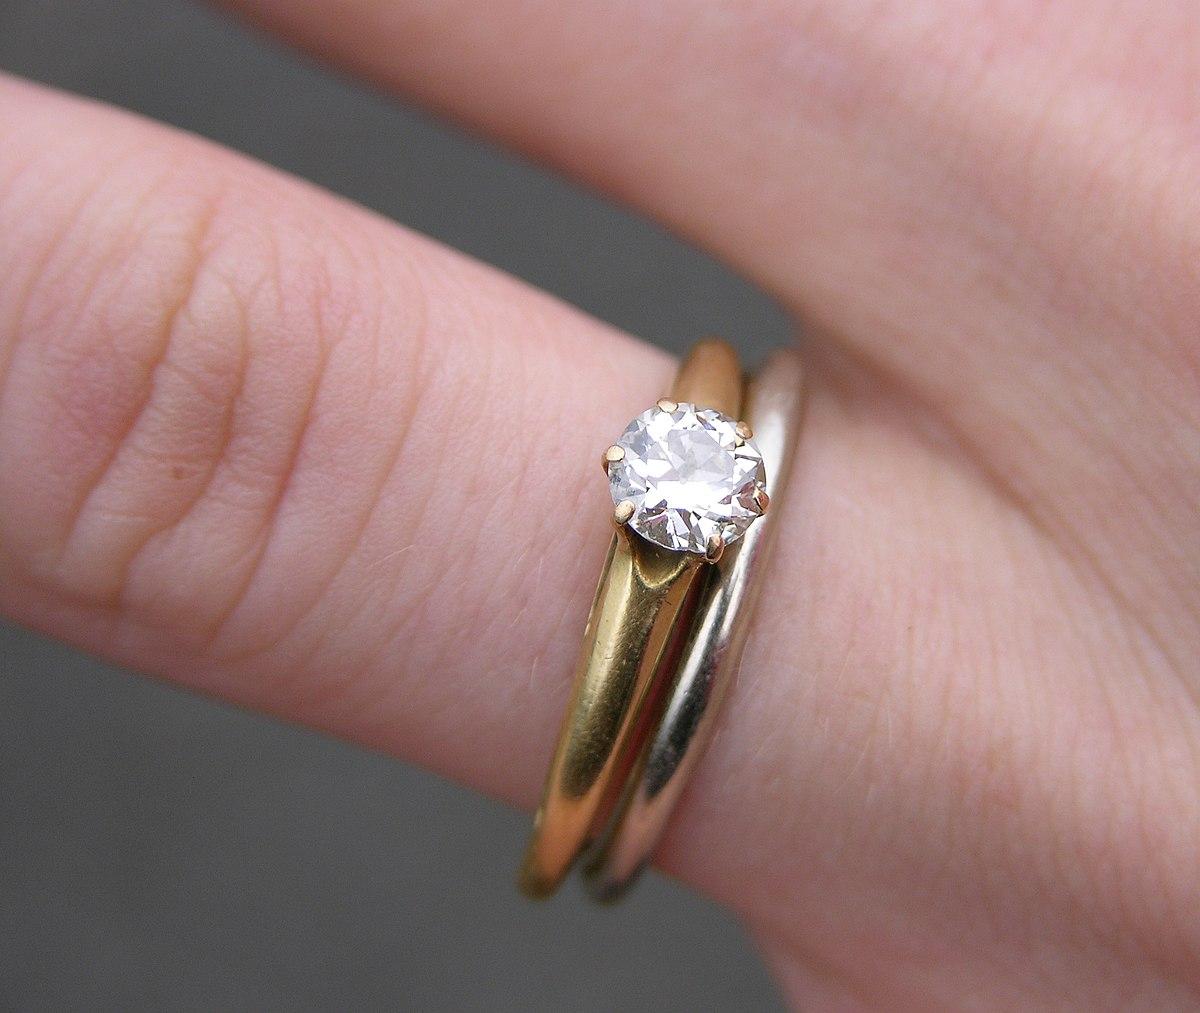 Engagement ring wedding ring diamond